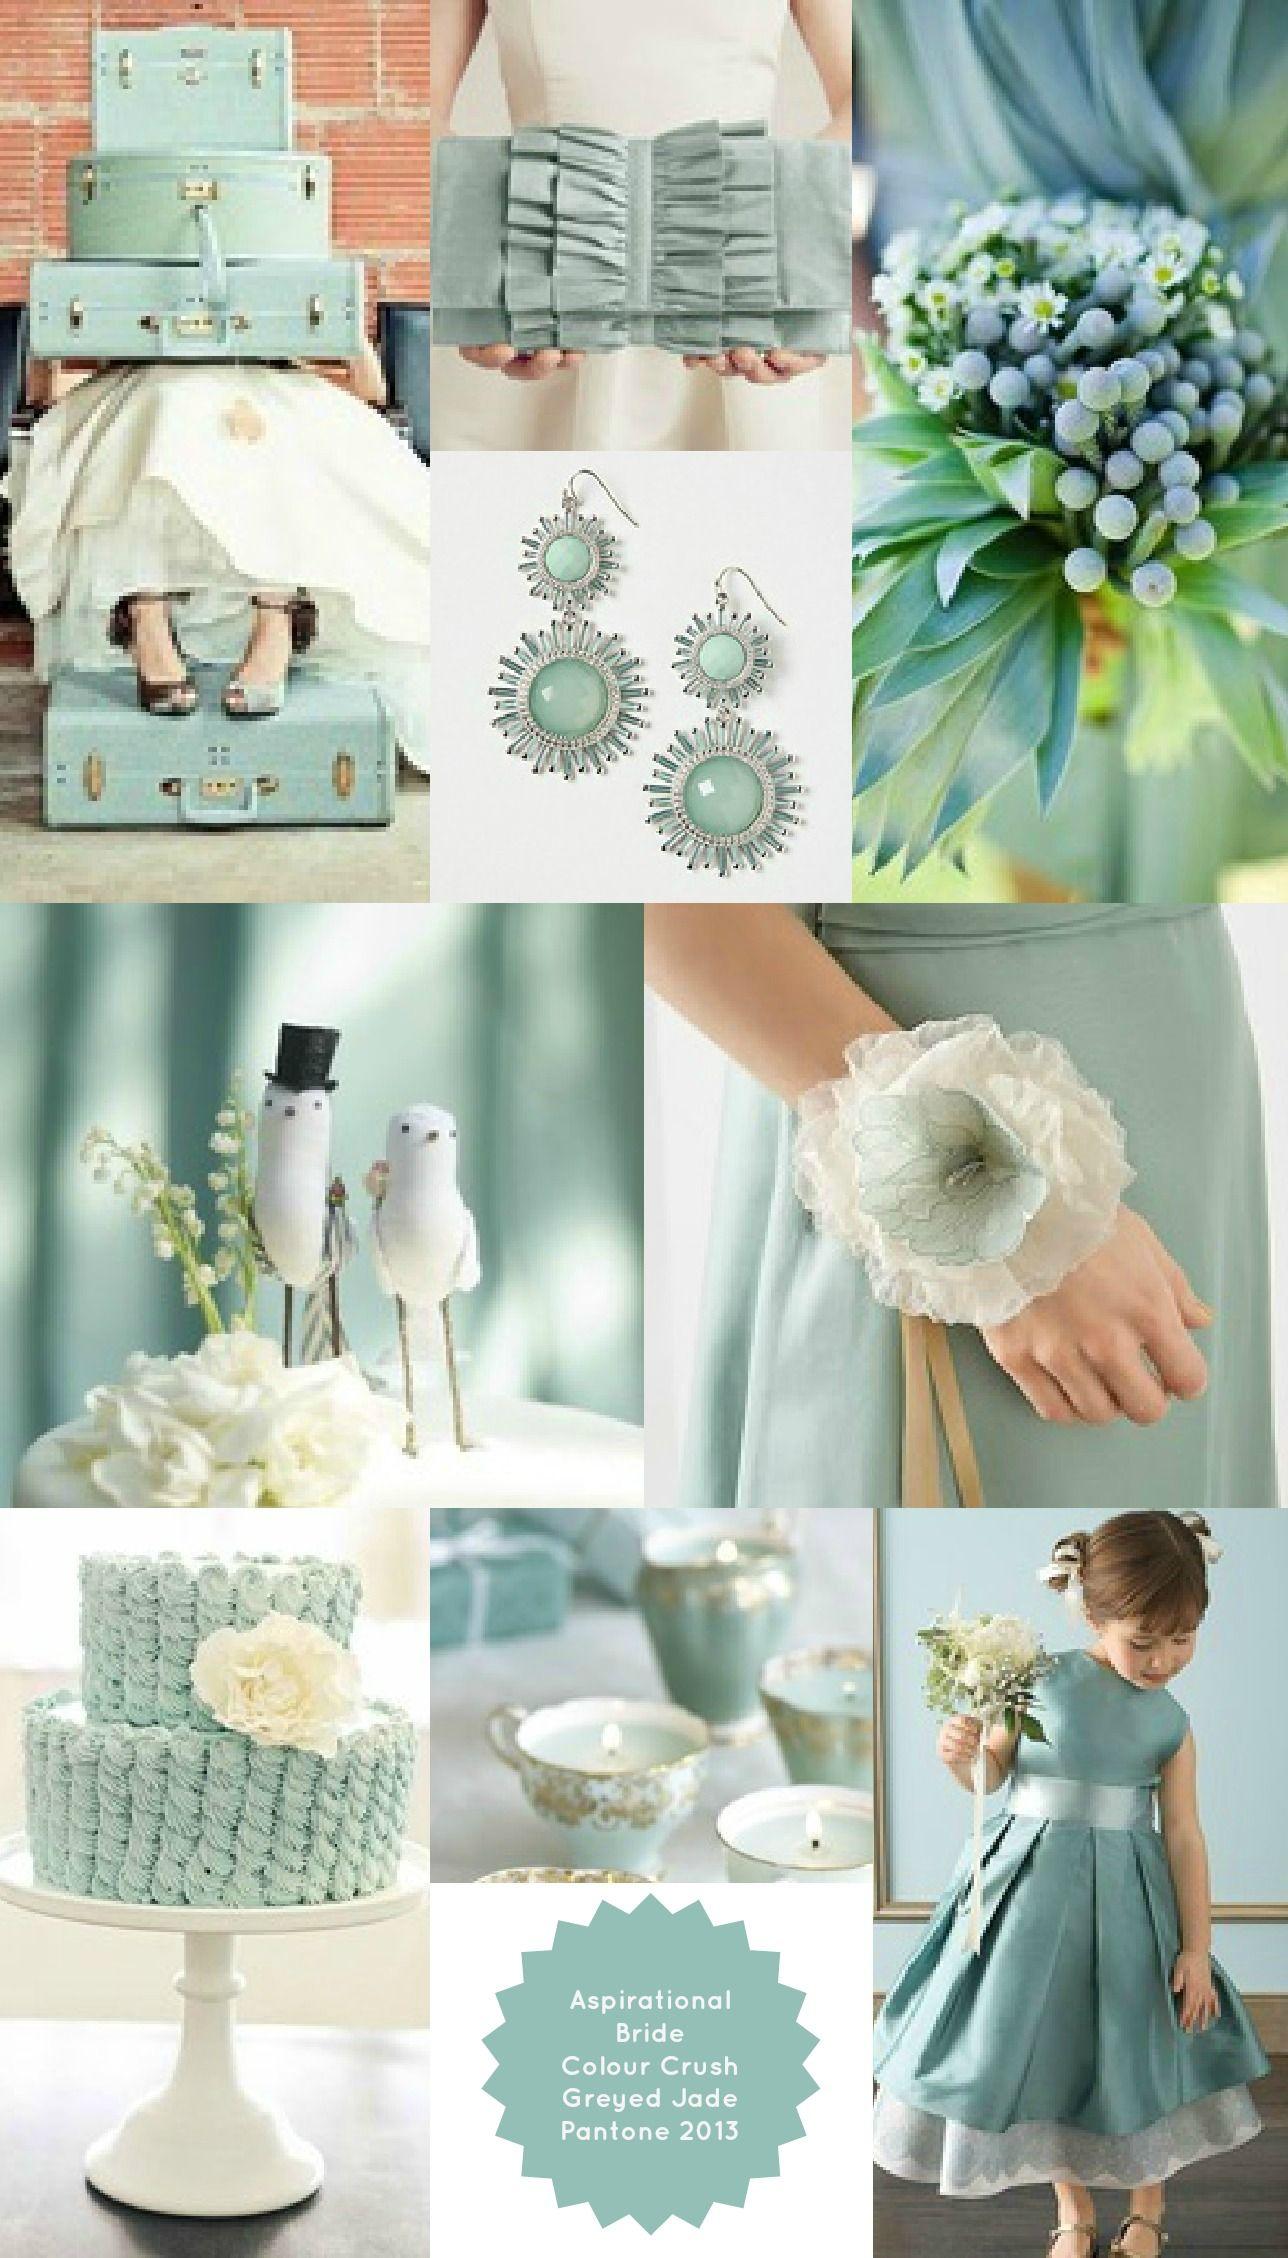 Pantone greyed jade wedding theme beautiful for vintage wedding pantone greyed jade wedding theme beautiful for vintage wedding love the color junglespirit Image collections